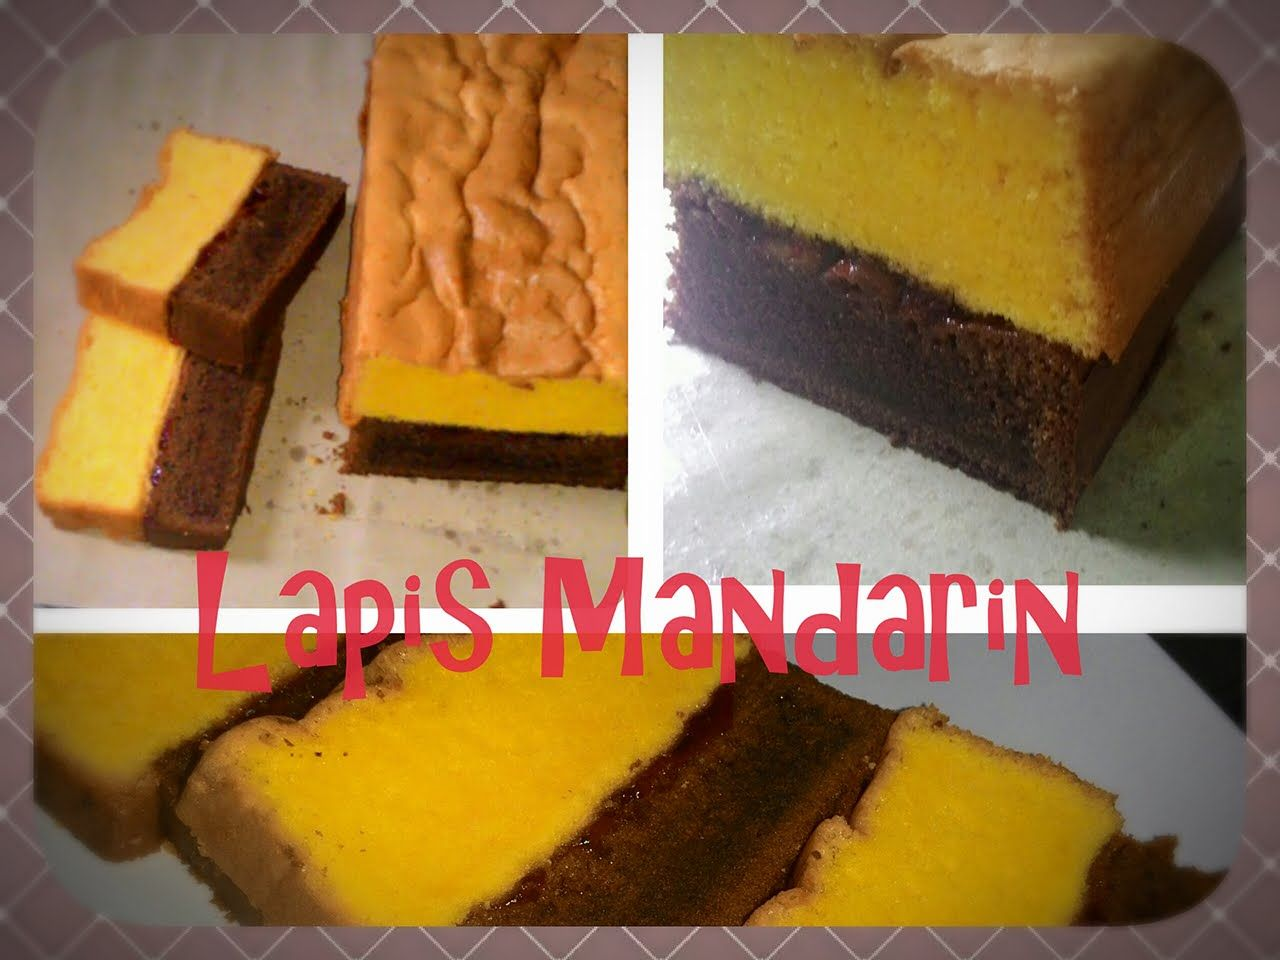 Resep Lapis Mandarin Lapis Surabaya Istimewa Ala Bakery Makanan Kue Resep